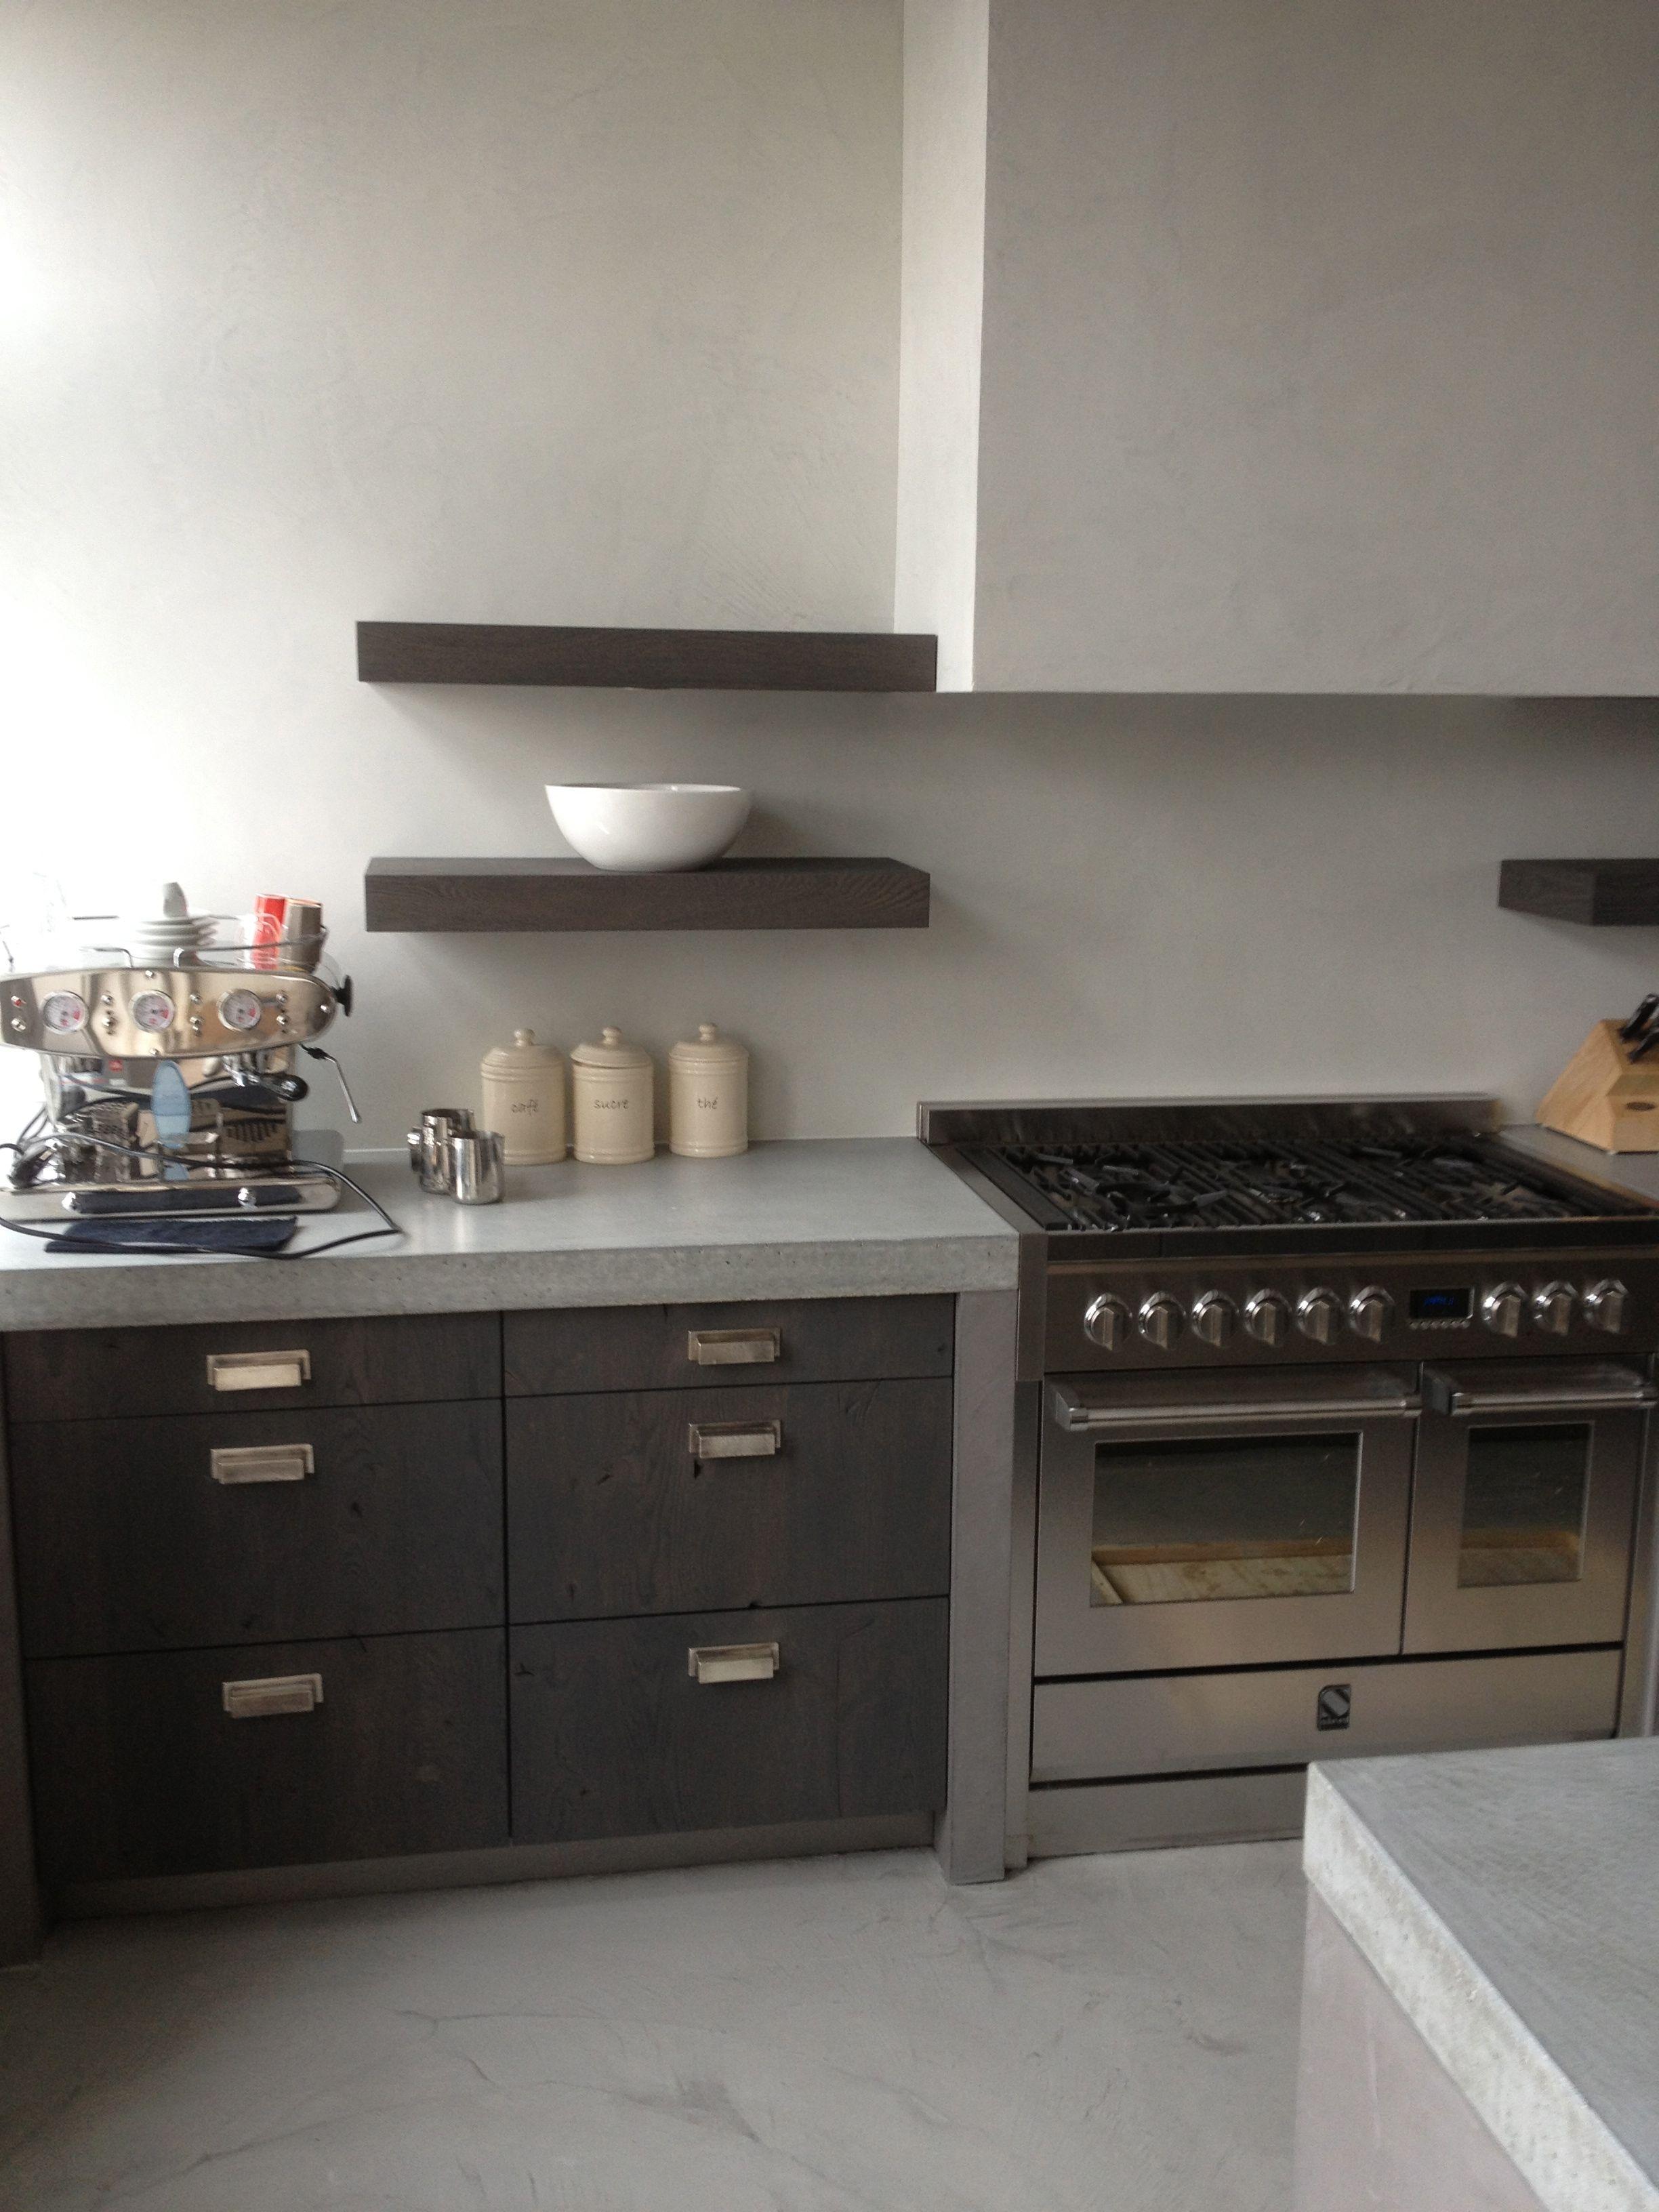 1000 images about mortex kitchen on pinterest stove the loft and concrete counter - Mortex Color